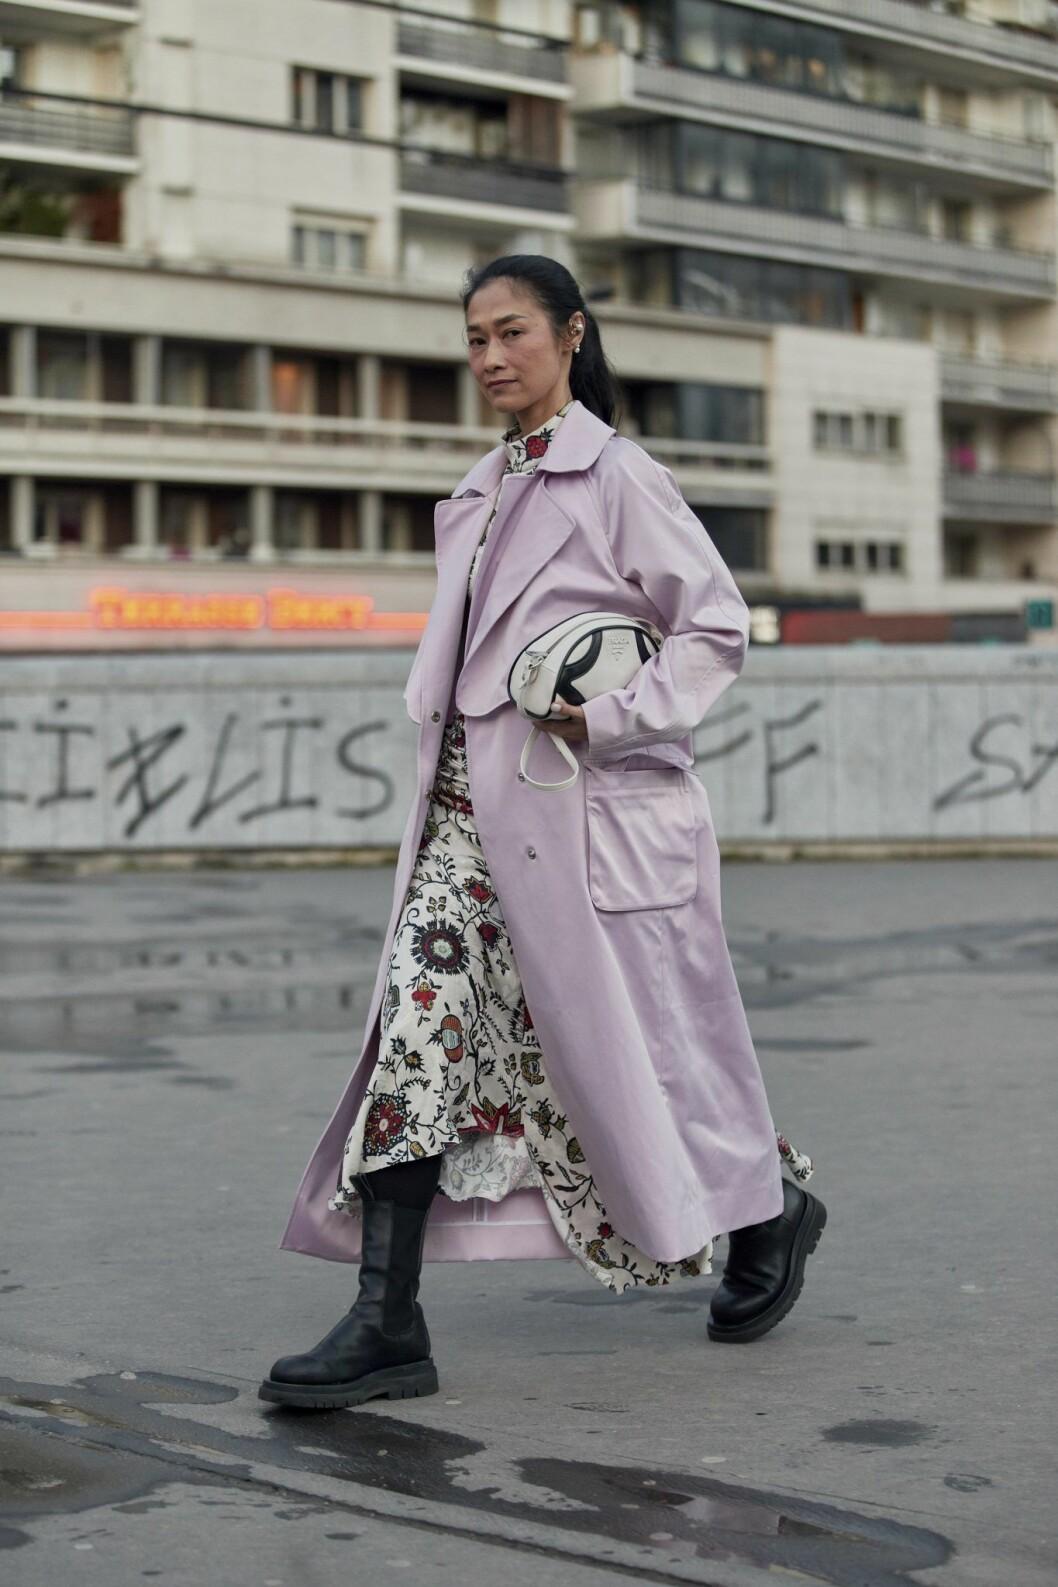 Lila trenchcoat Streetstyle Paris Fashion Week AW20.